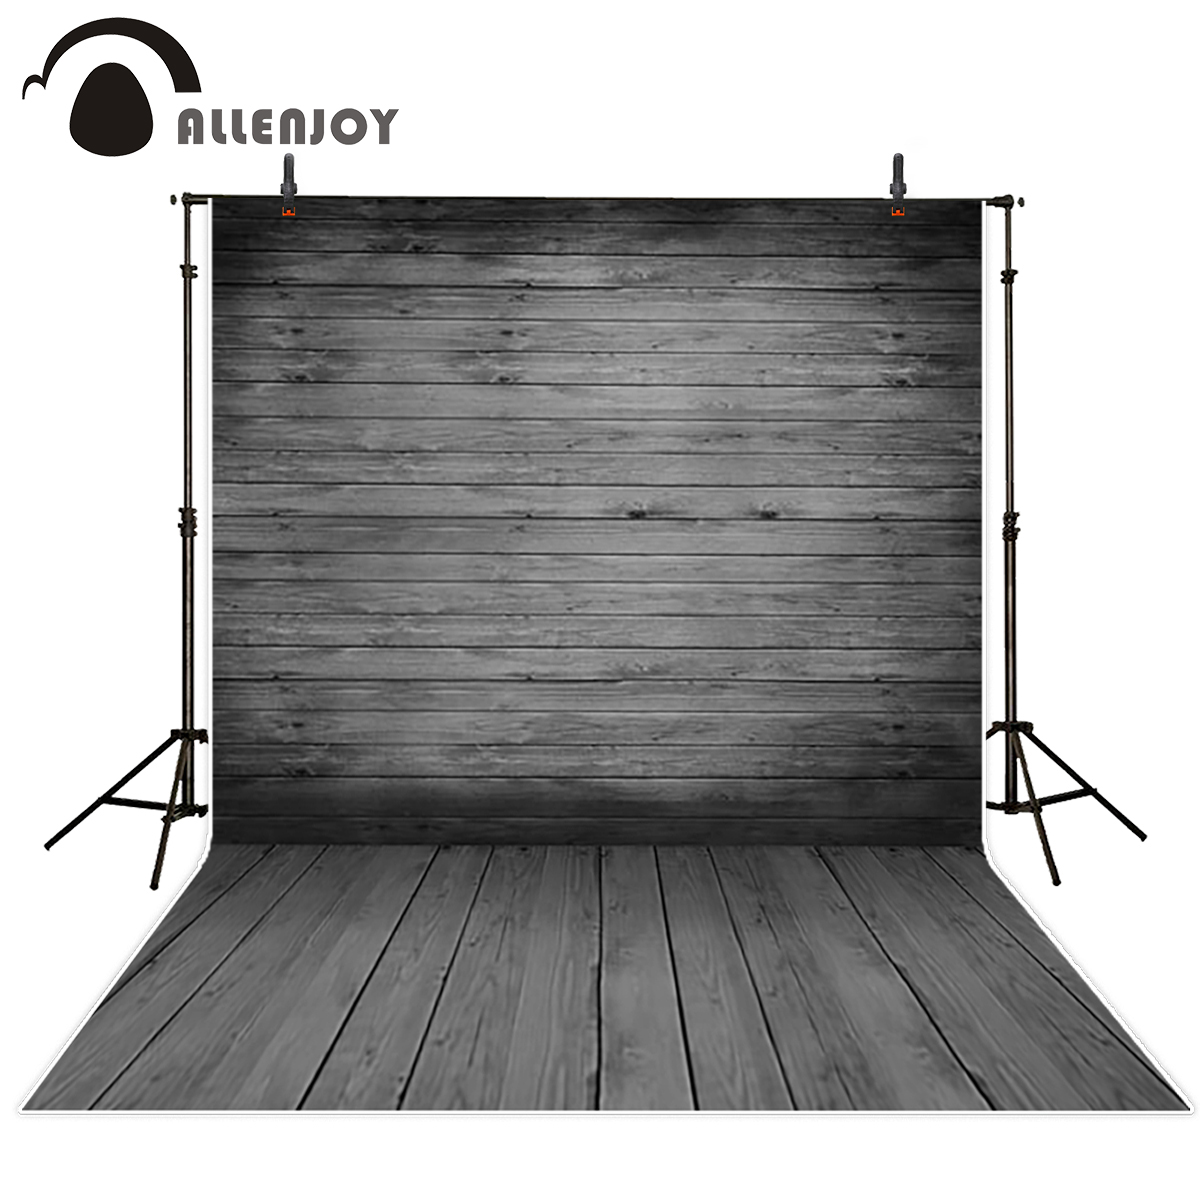 Allenjoy gray wood wall floor photography background plank board newborn baby shower custom backdrop photo studio photocall